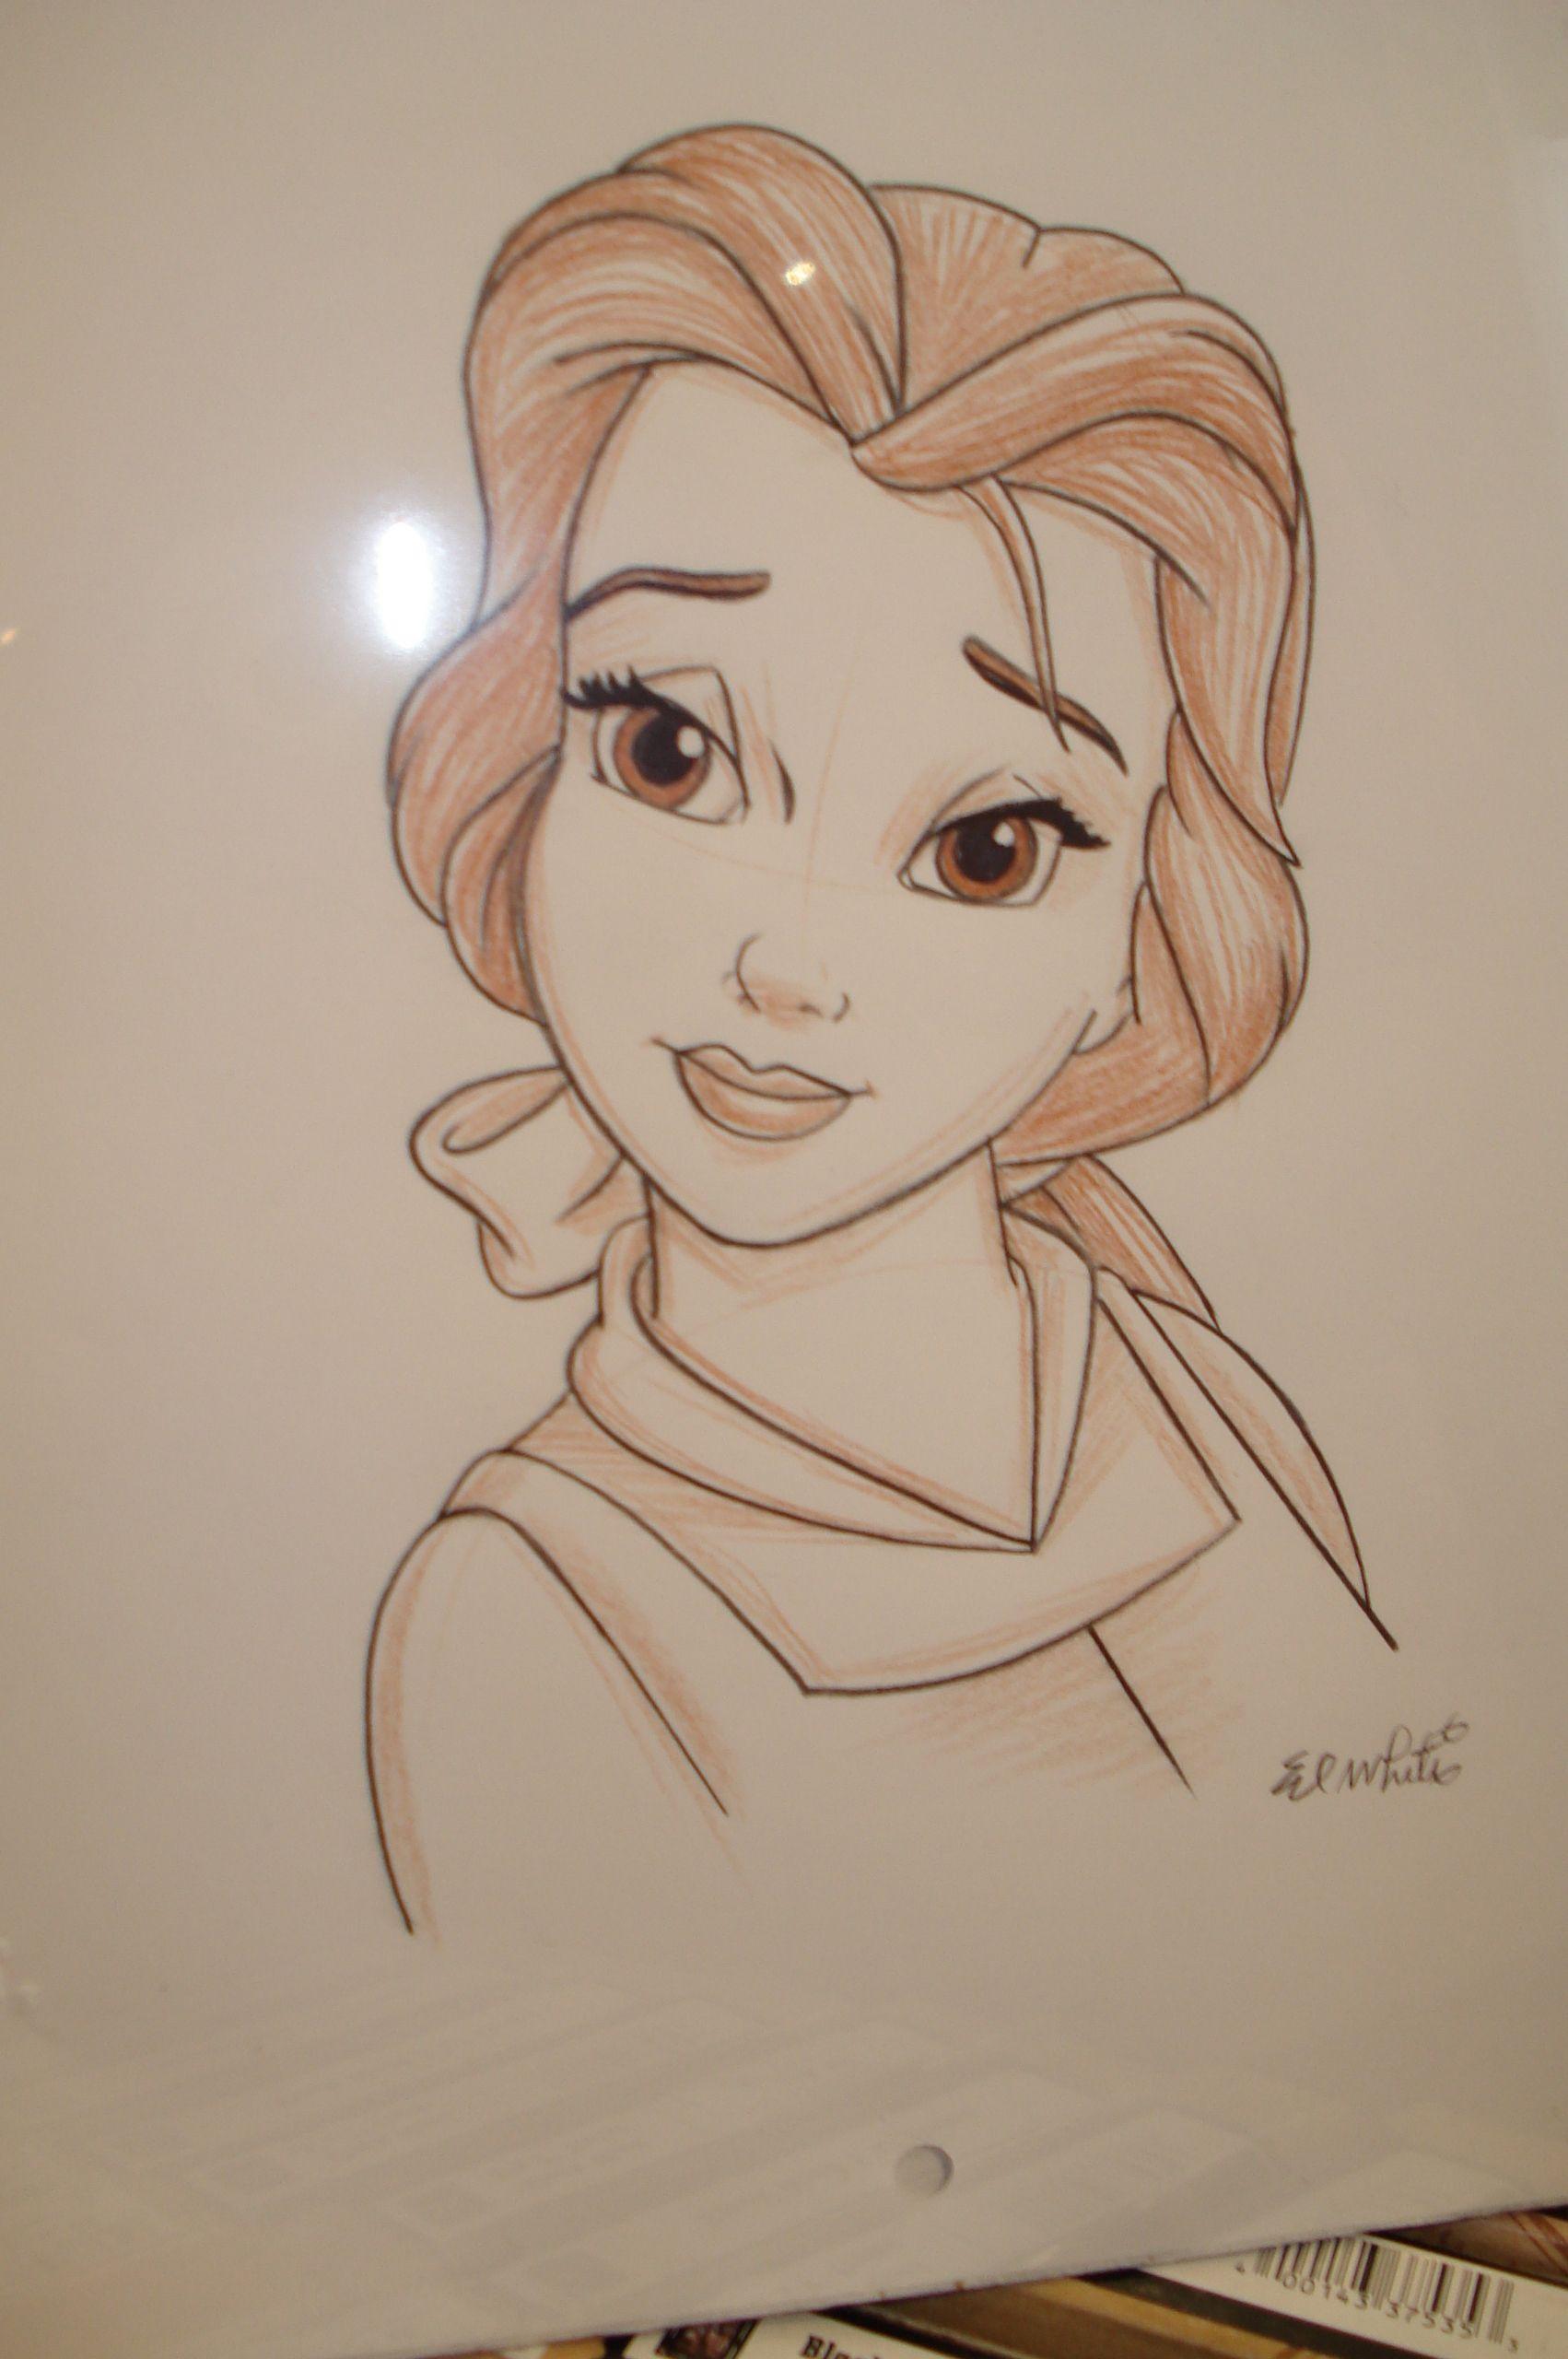 Disney Princess Photo Disney Princess Drawings Princess Drawings Disney Princess Drawings Princess Sketches